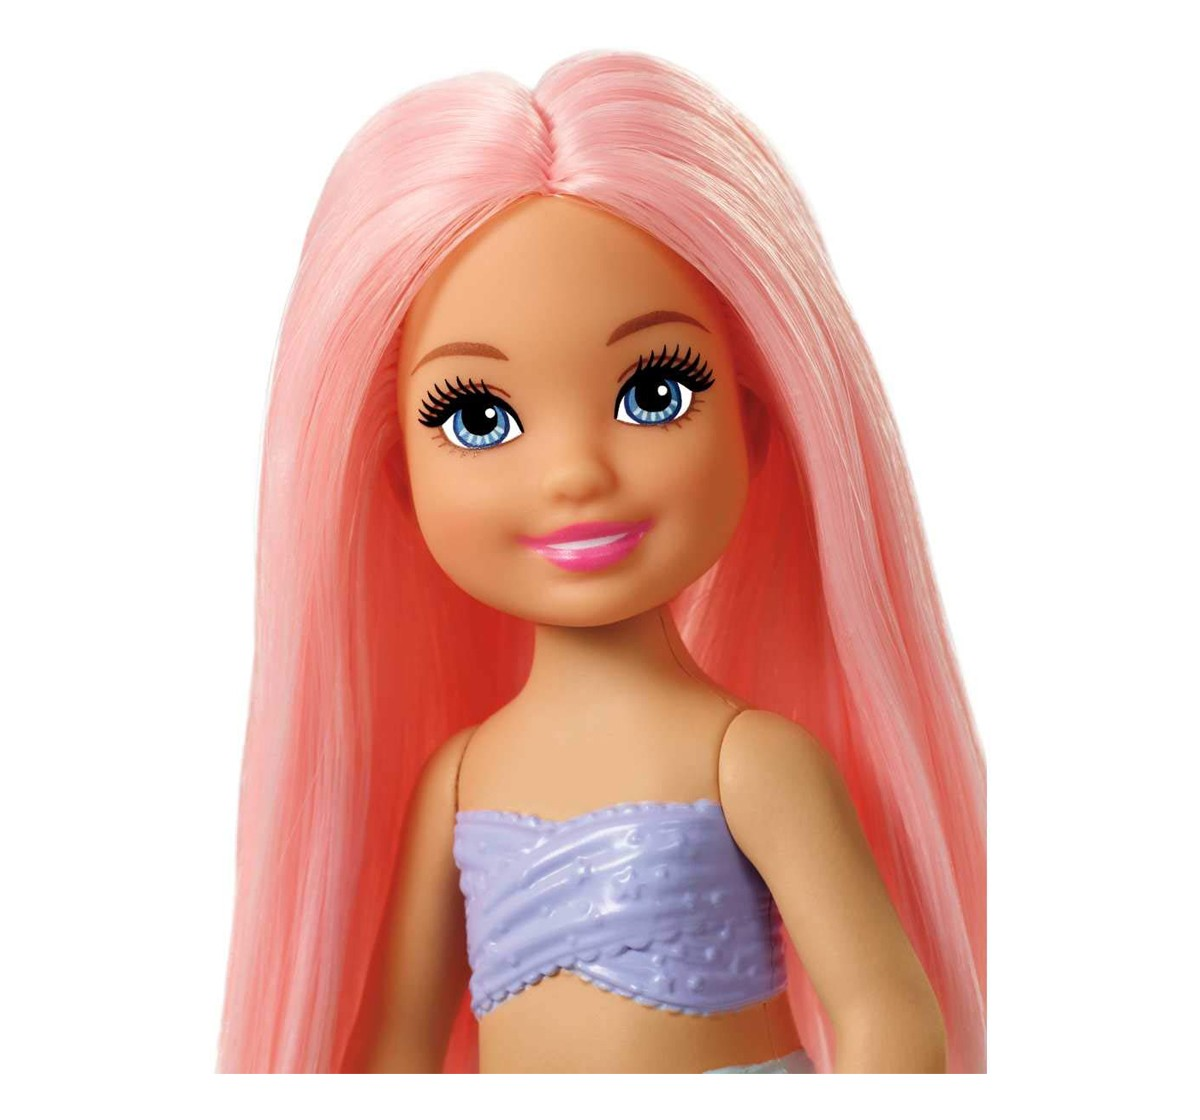 Barbie Dreamtopia Chelsea Mermaid Playset Dolls & Accessories for Girls age 3Y+